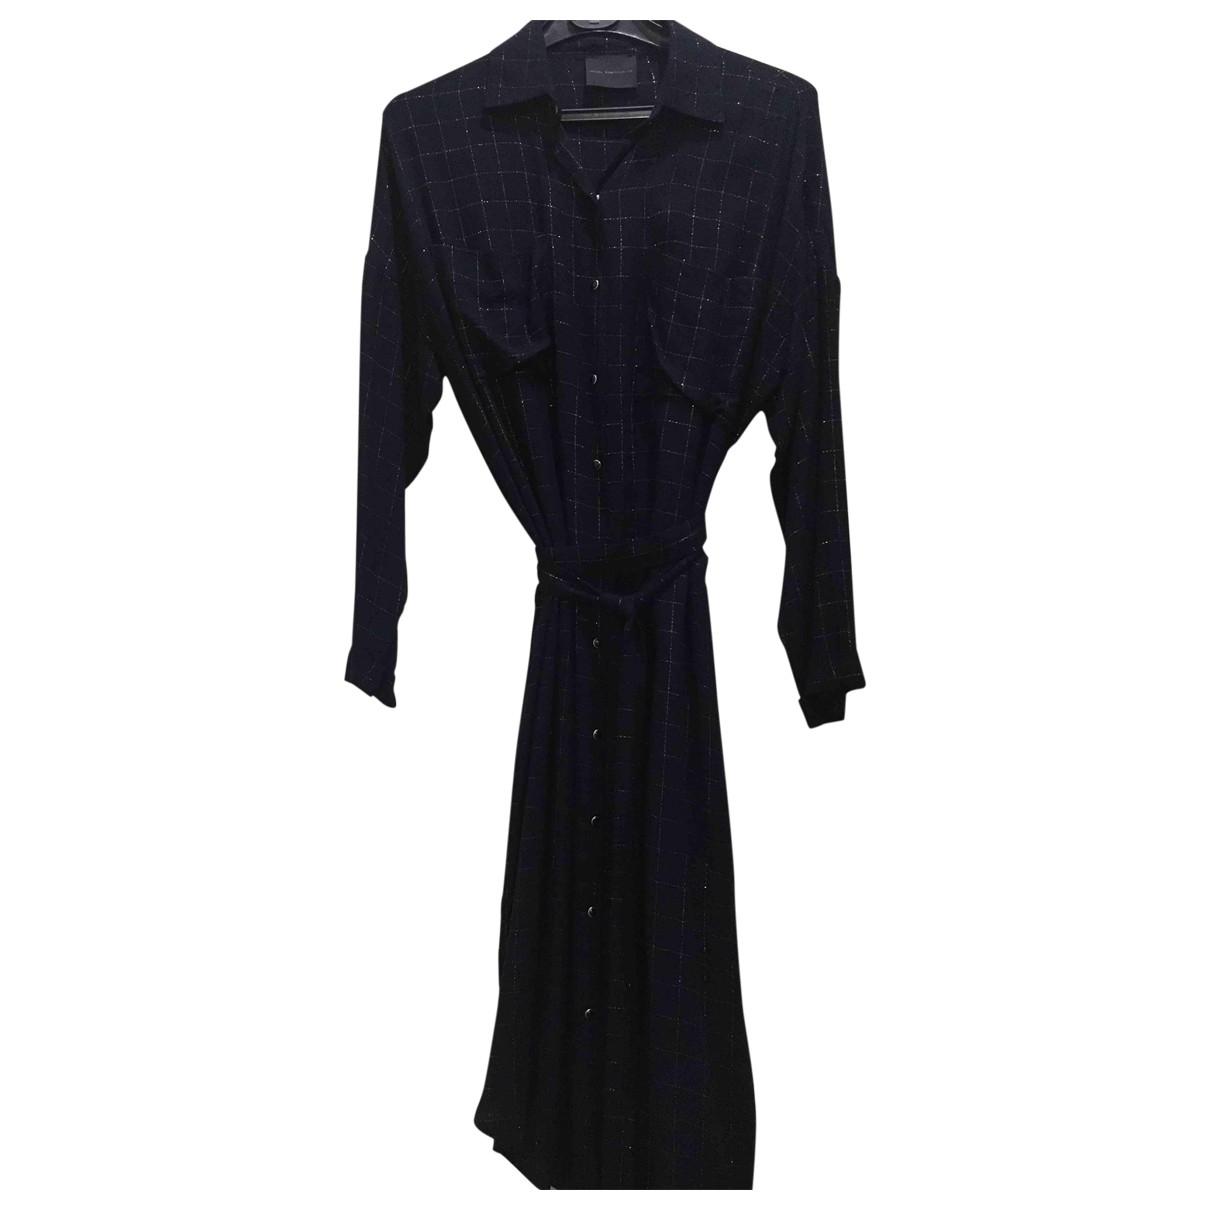 Hôtel Particulier \N Blue Wool dress for Women 1 0-5